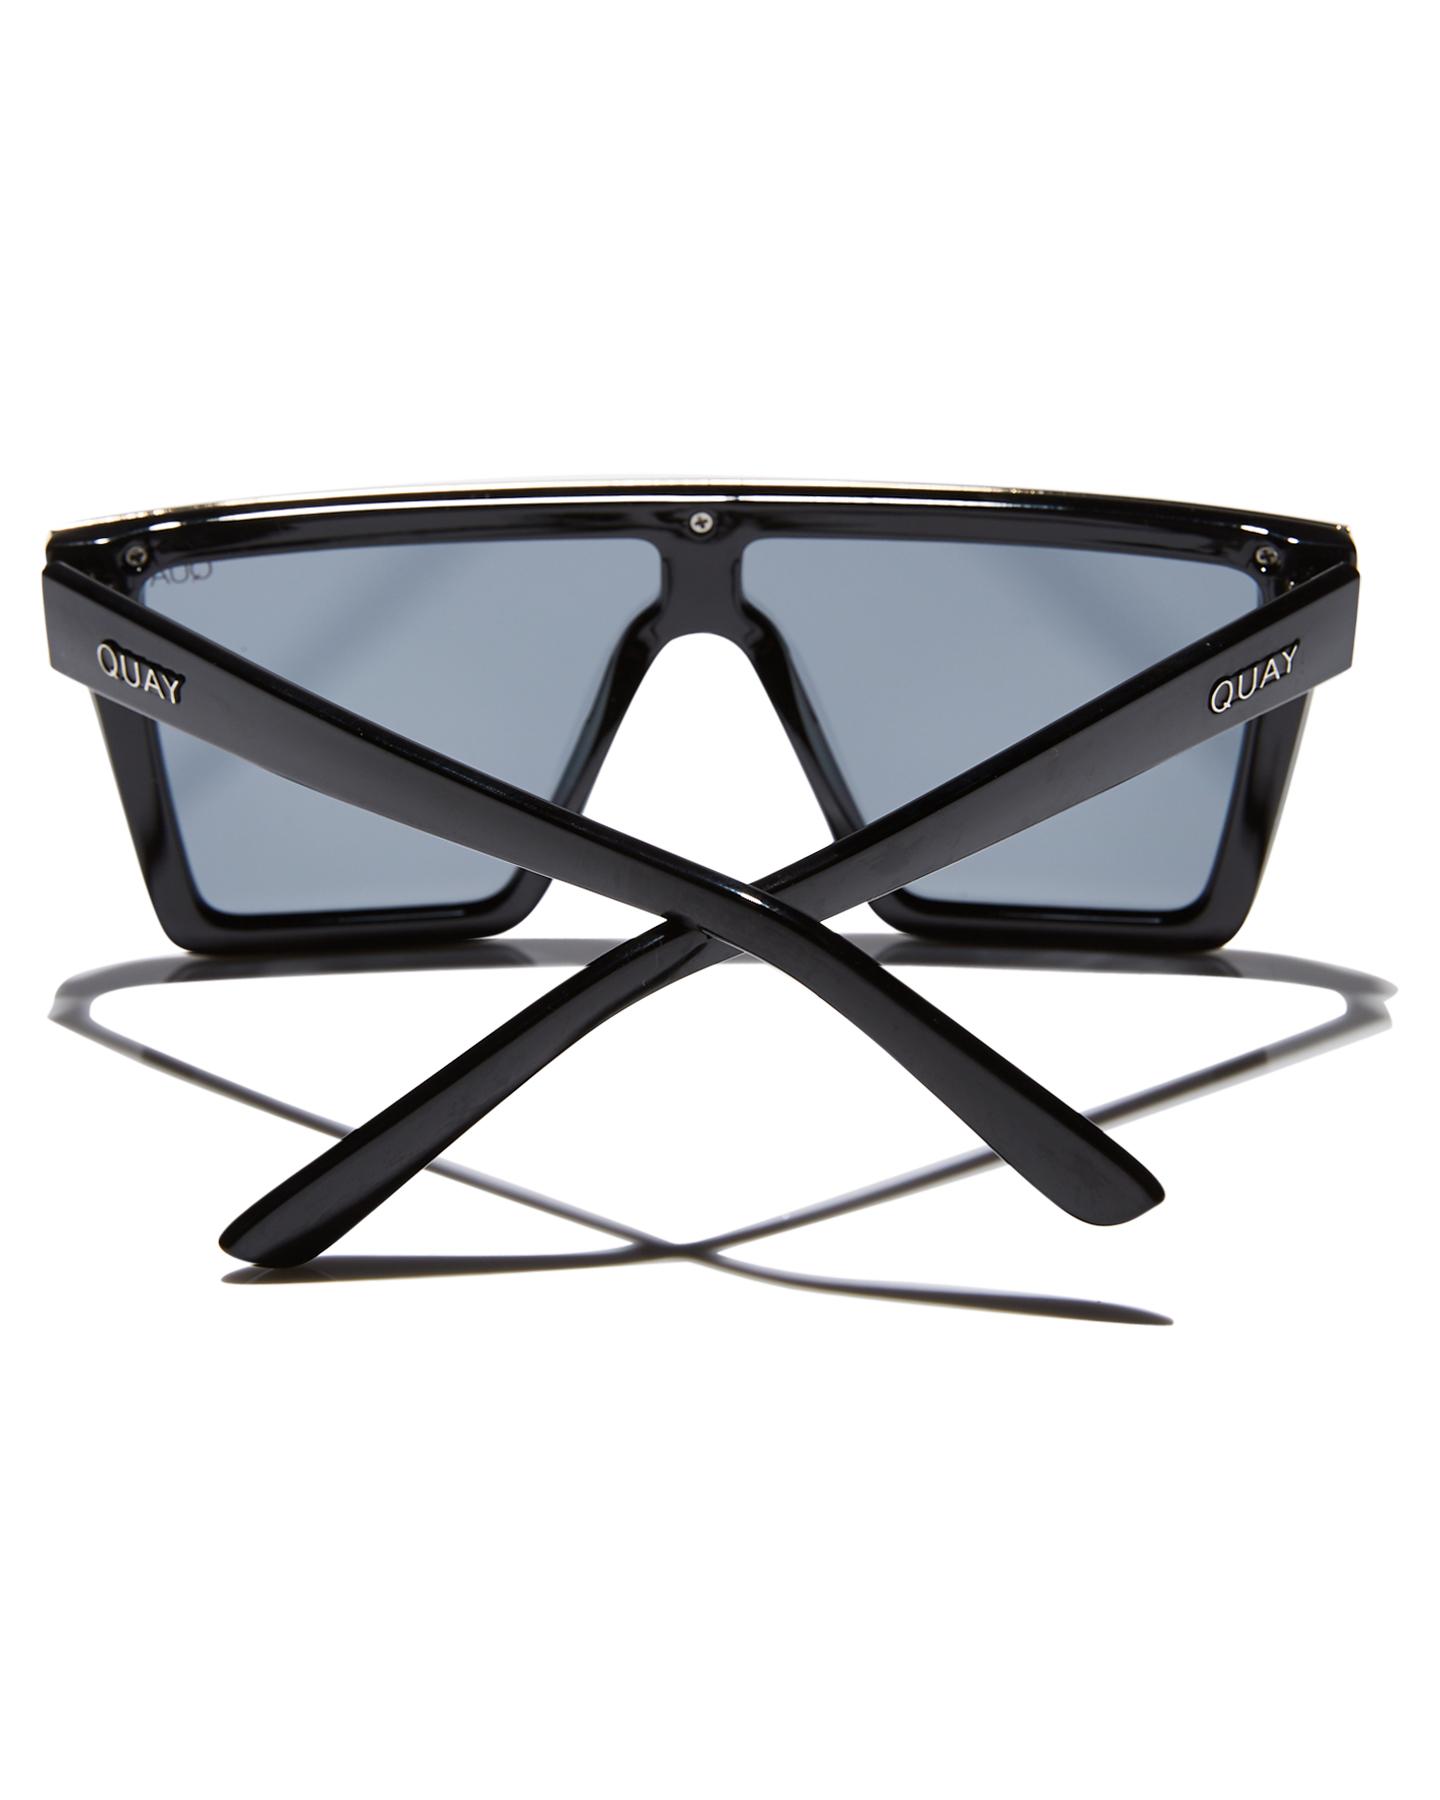 New-Quay-Eyewear-Women-039-s-Hindsight-Sunglasses-Stainless-Steel-Glass-Pink thumbnail 9